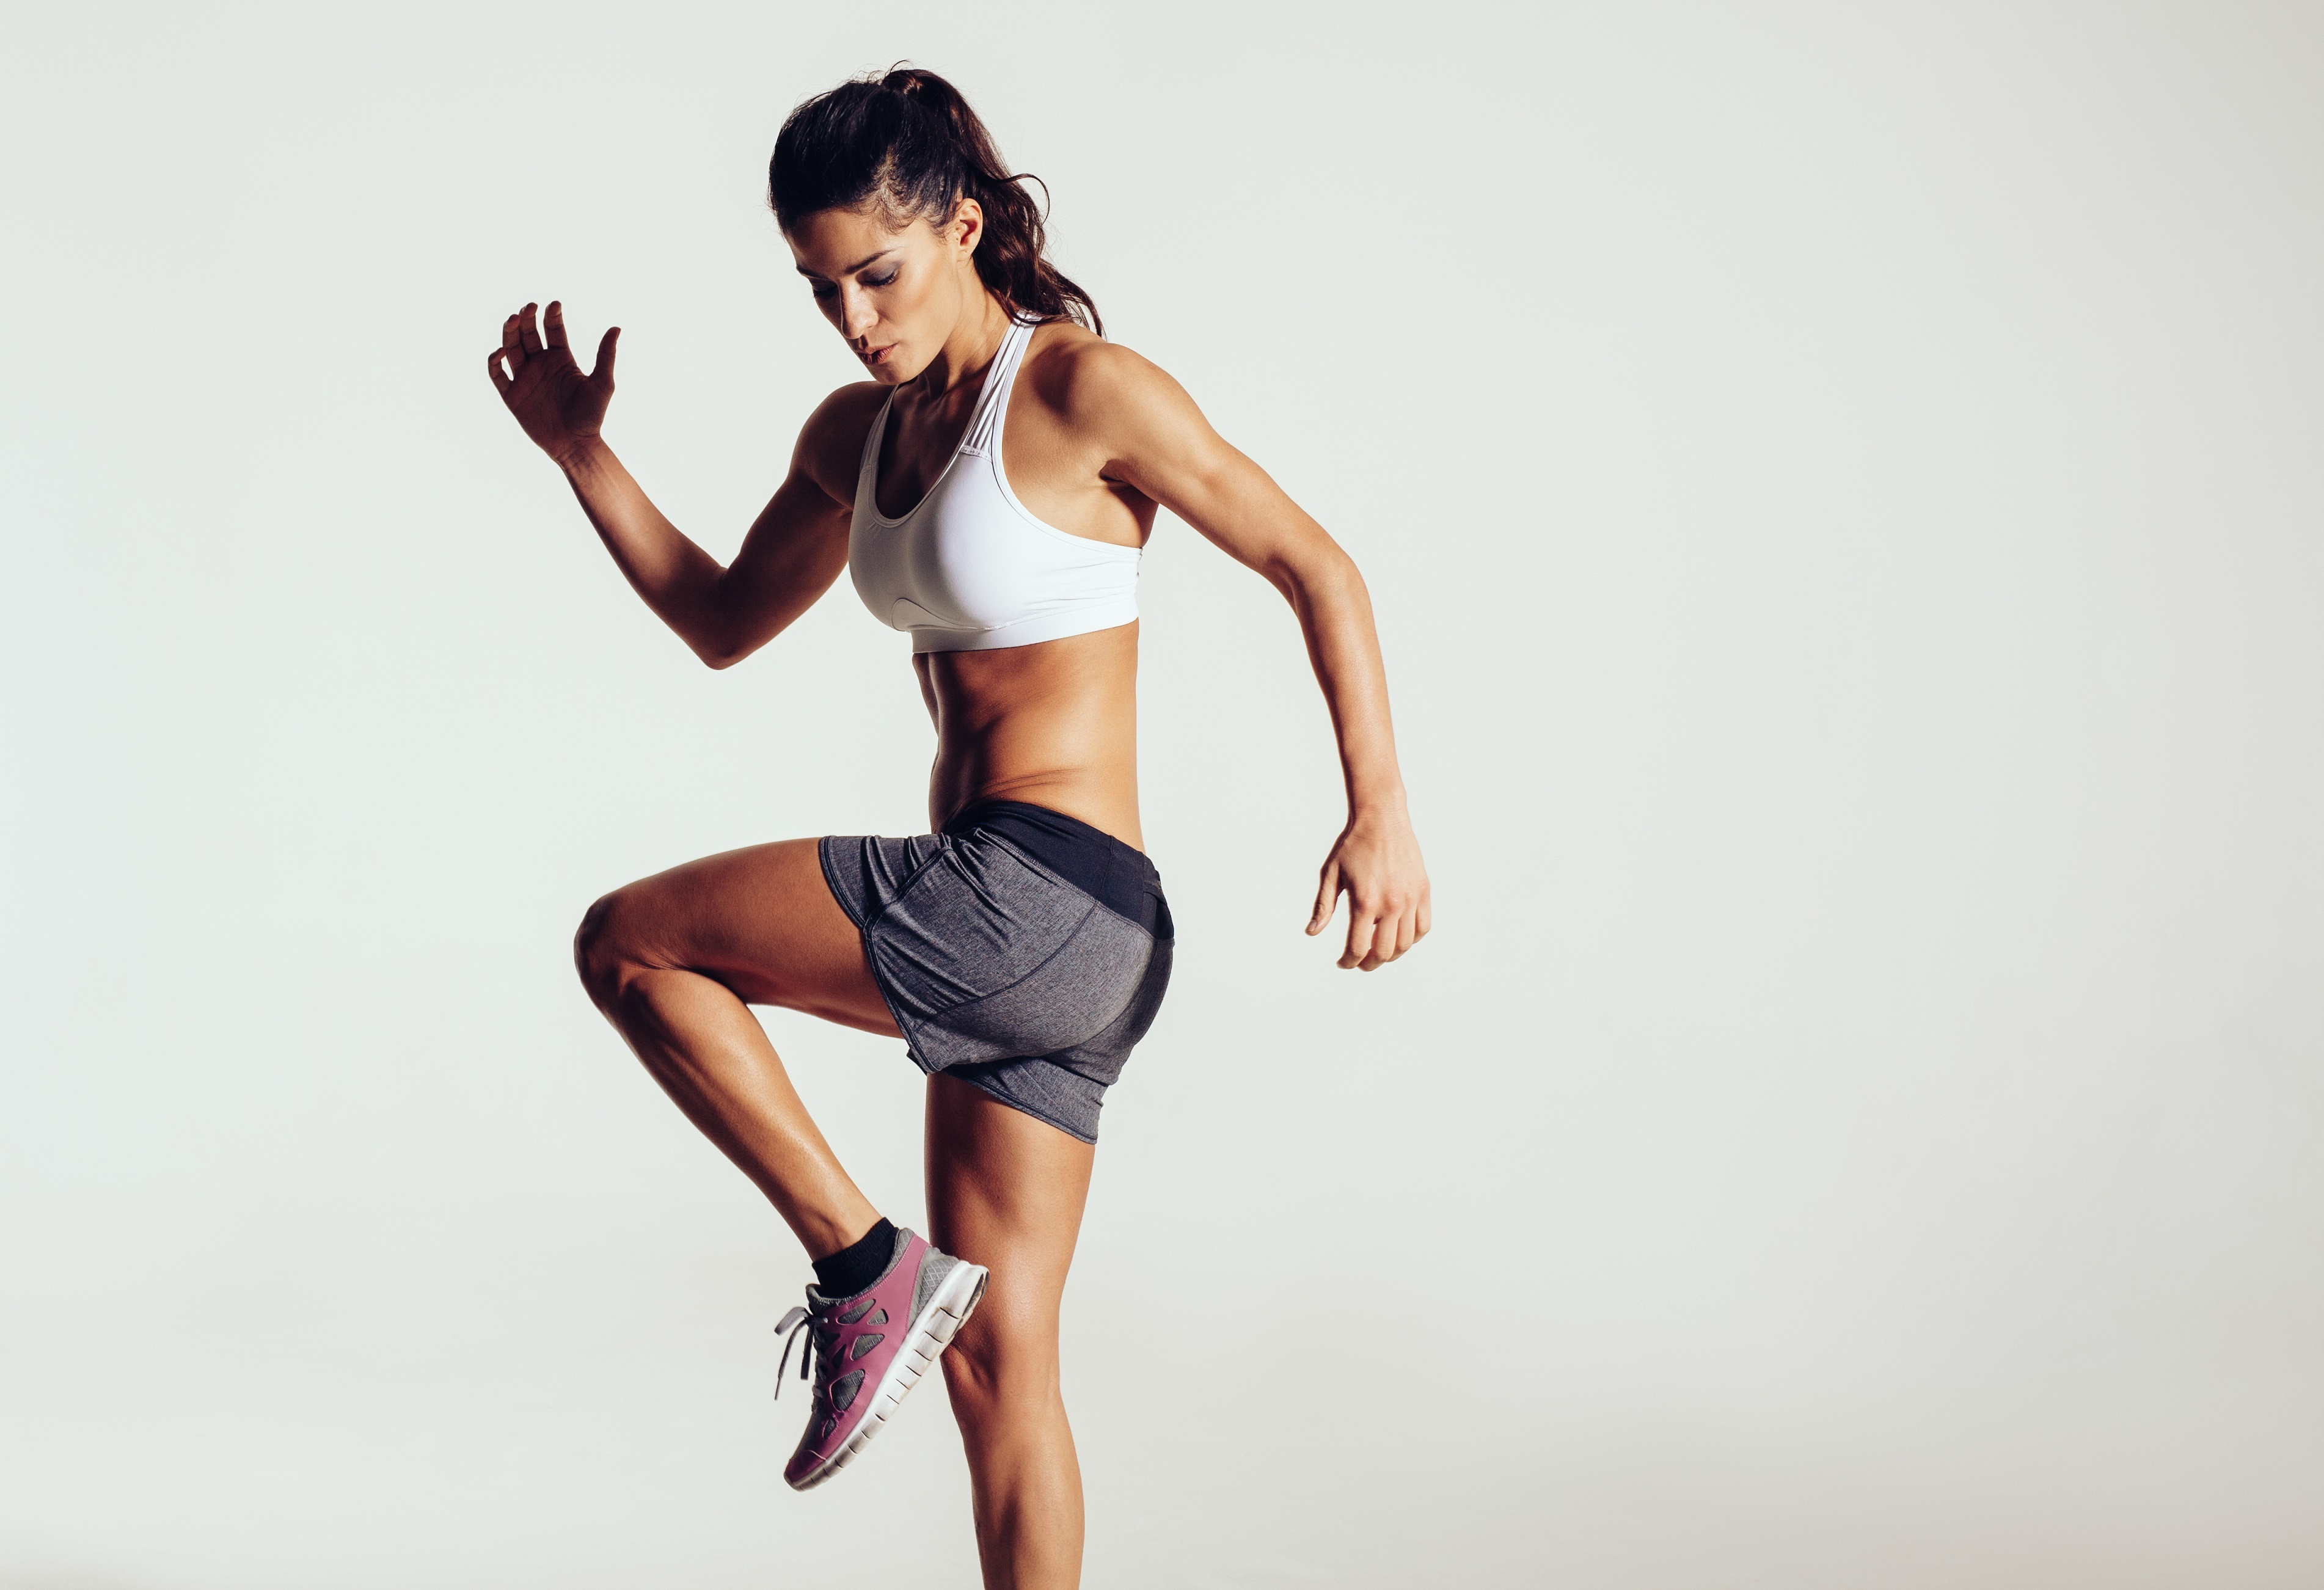 Fitness Fondo De Pantalla Hd Fondo De Escritorio